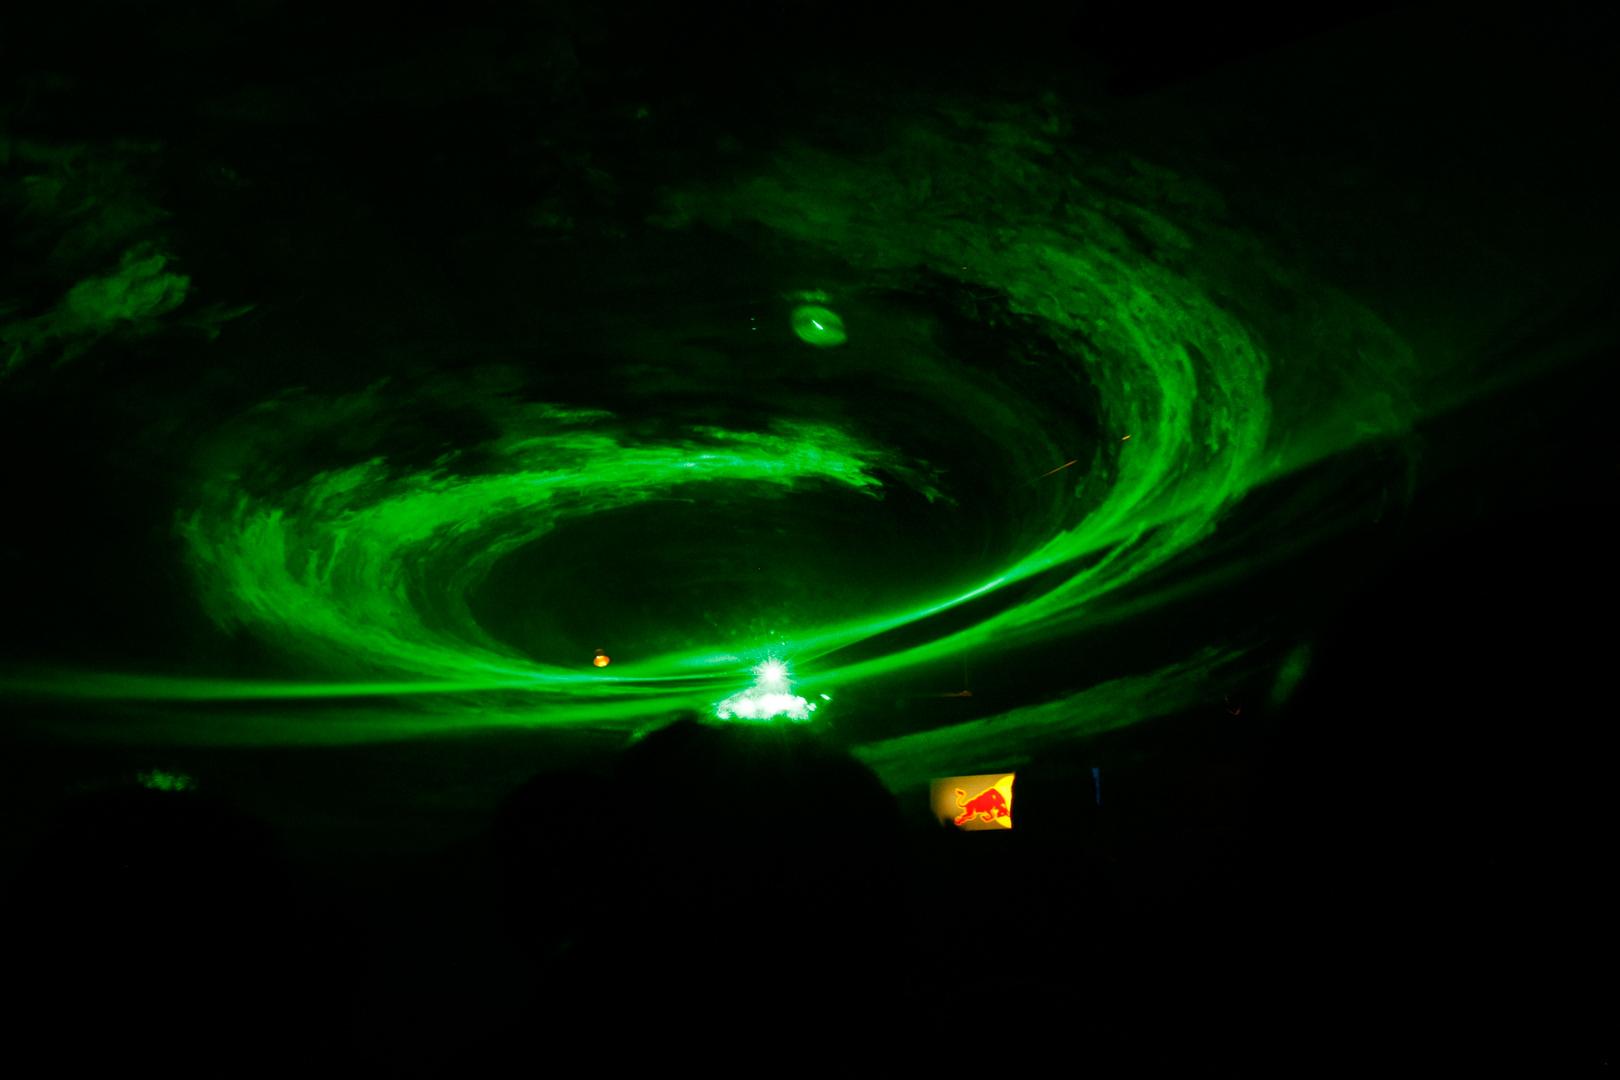 Grüner Nebel